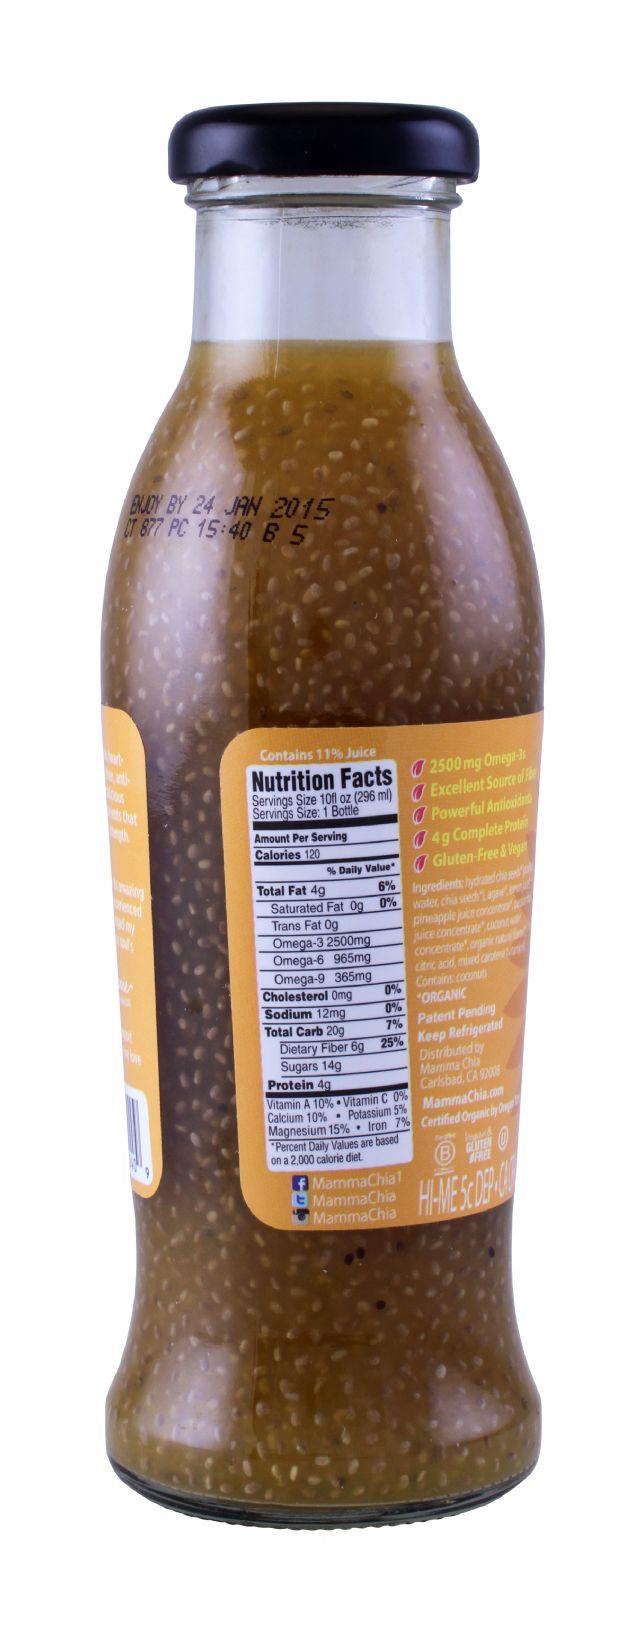 Mamma Chia Organic Vitality Beverages: MammaChia PineappleCoco Facts